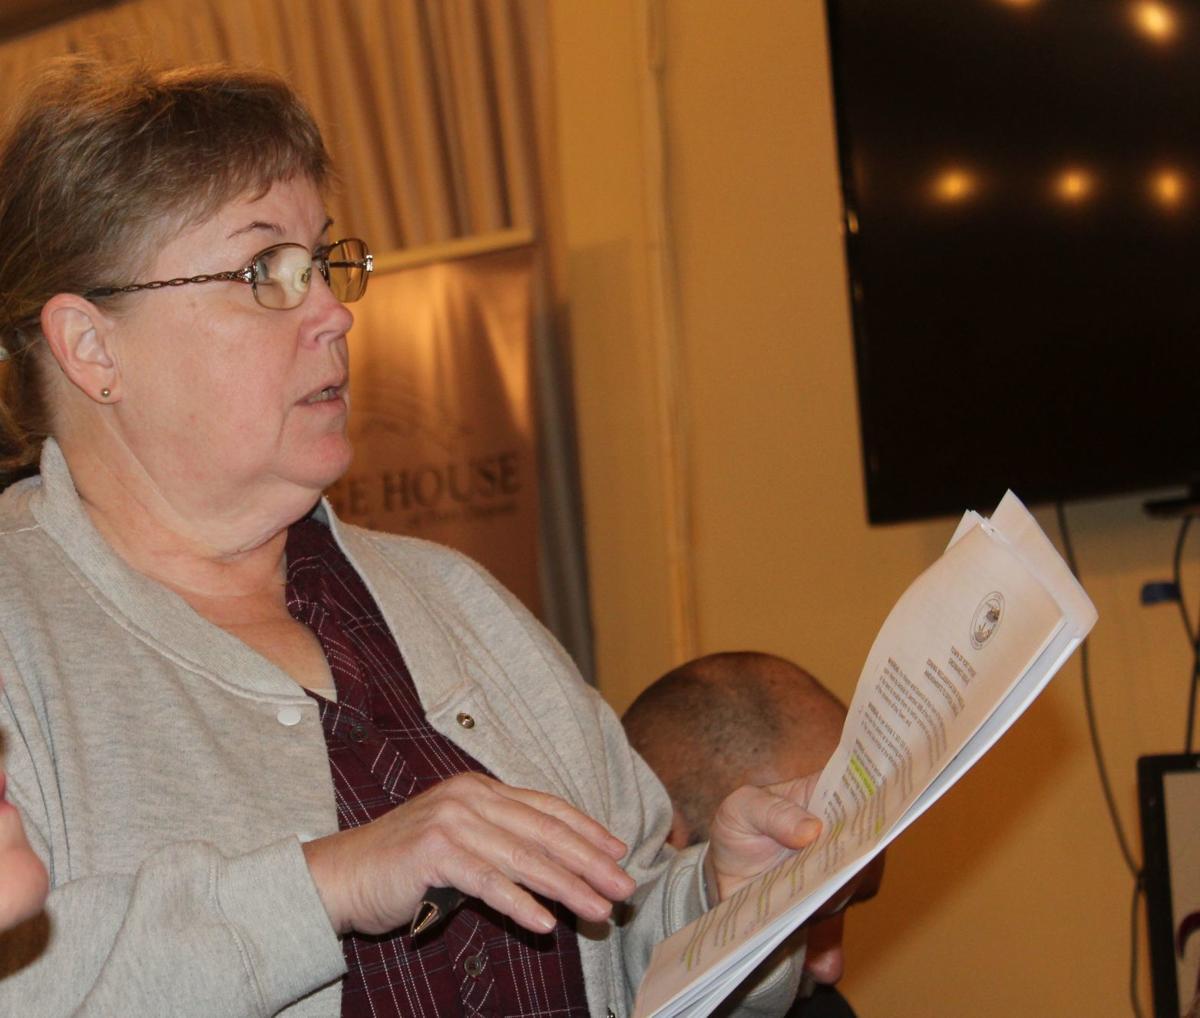 Port approves zoning changes ahead of Bainbridge development